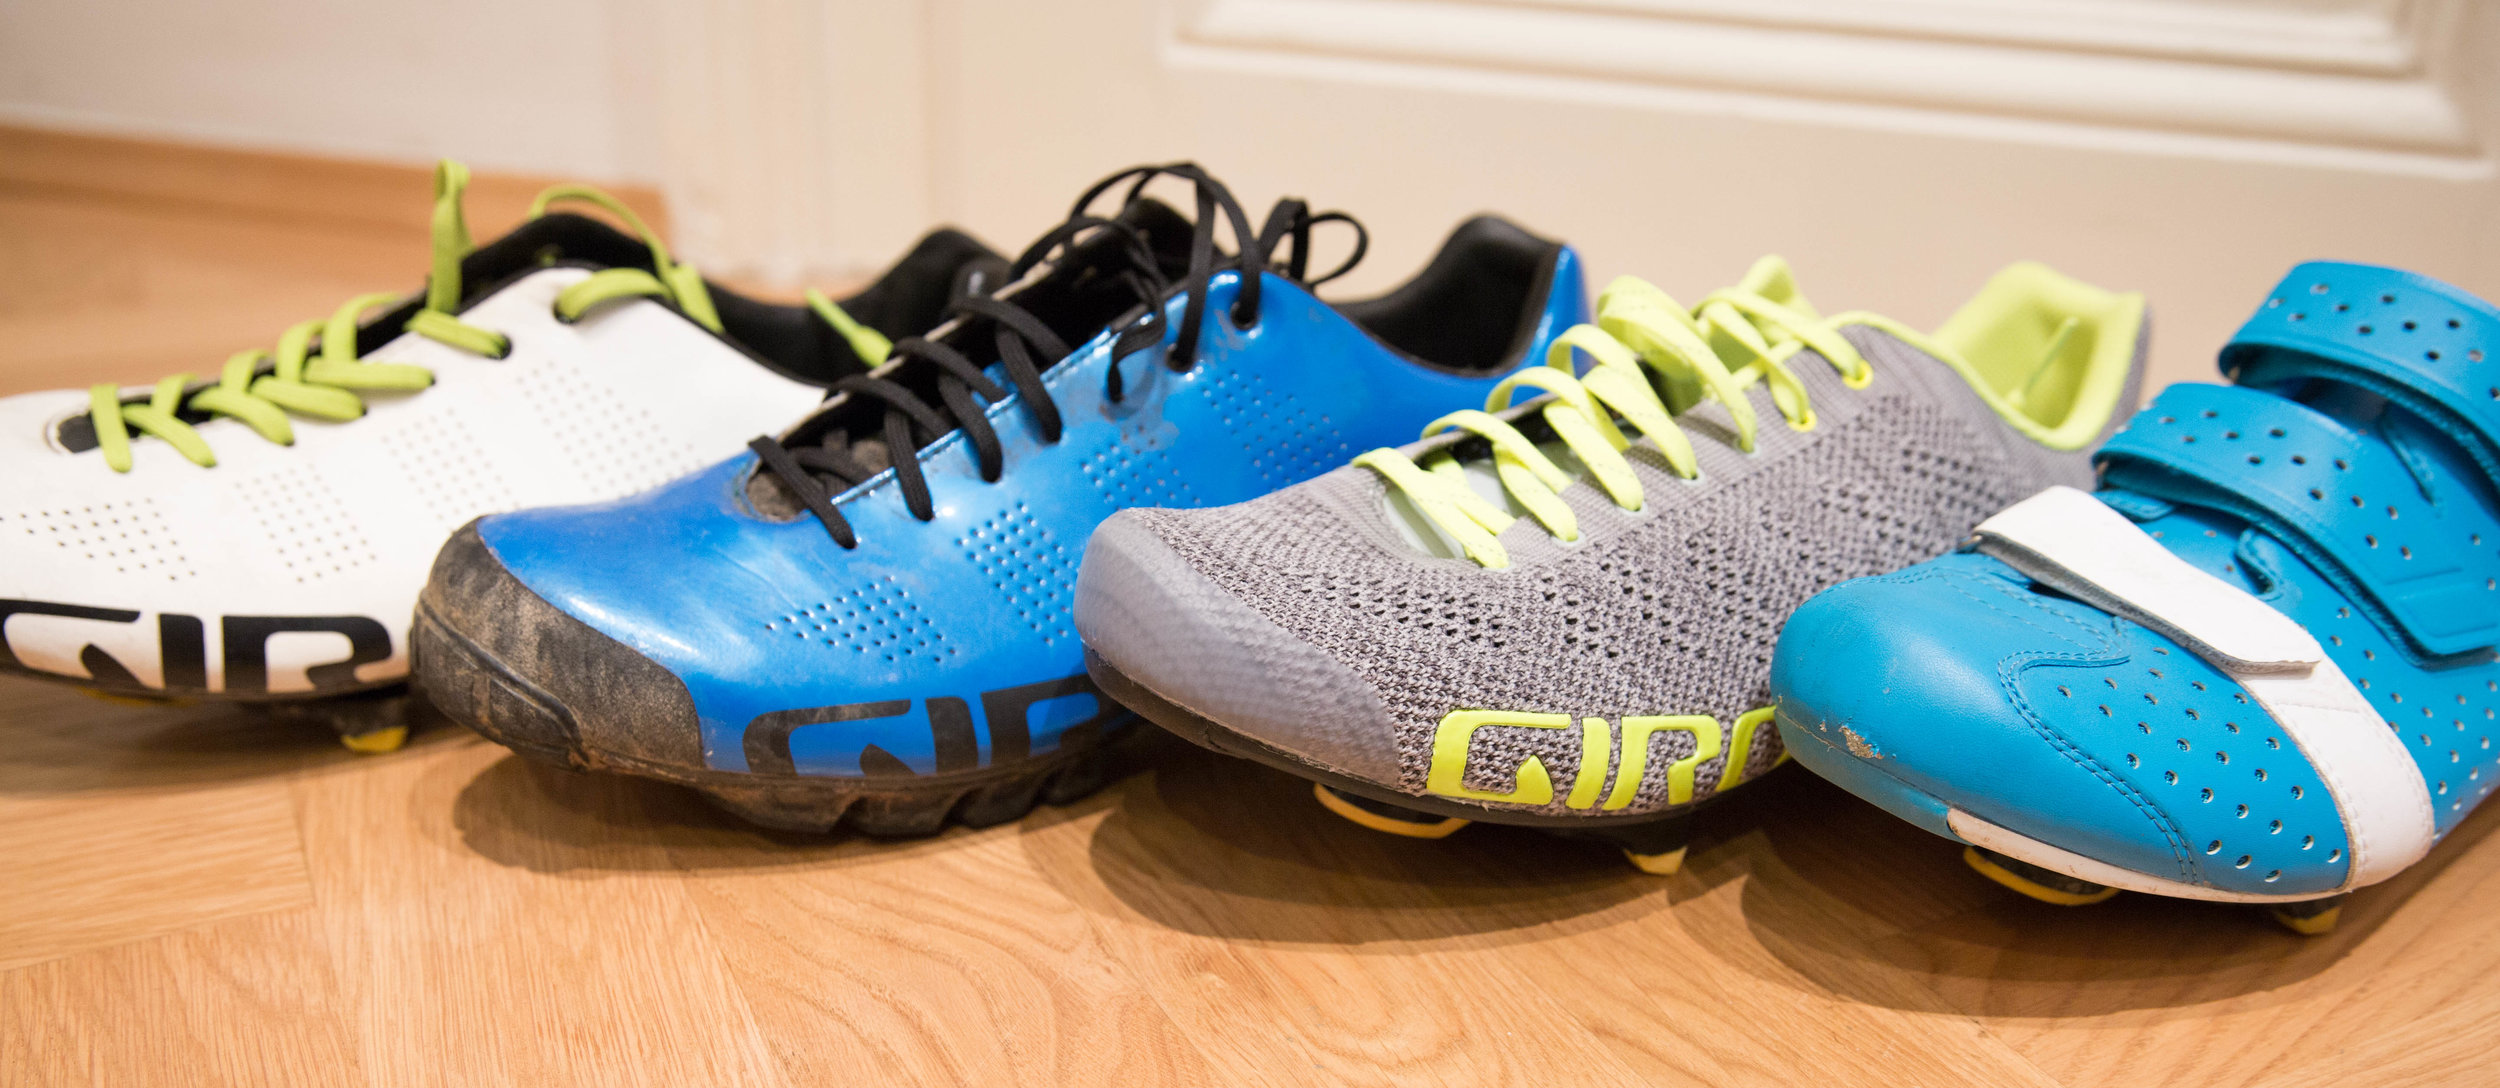 Im 169k-Einsatz: Empire ACC, Empire V90 (MTB), Empire E70 Knit, Rapha Climbers Shoes (mit Easton-E90-Sohle)